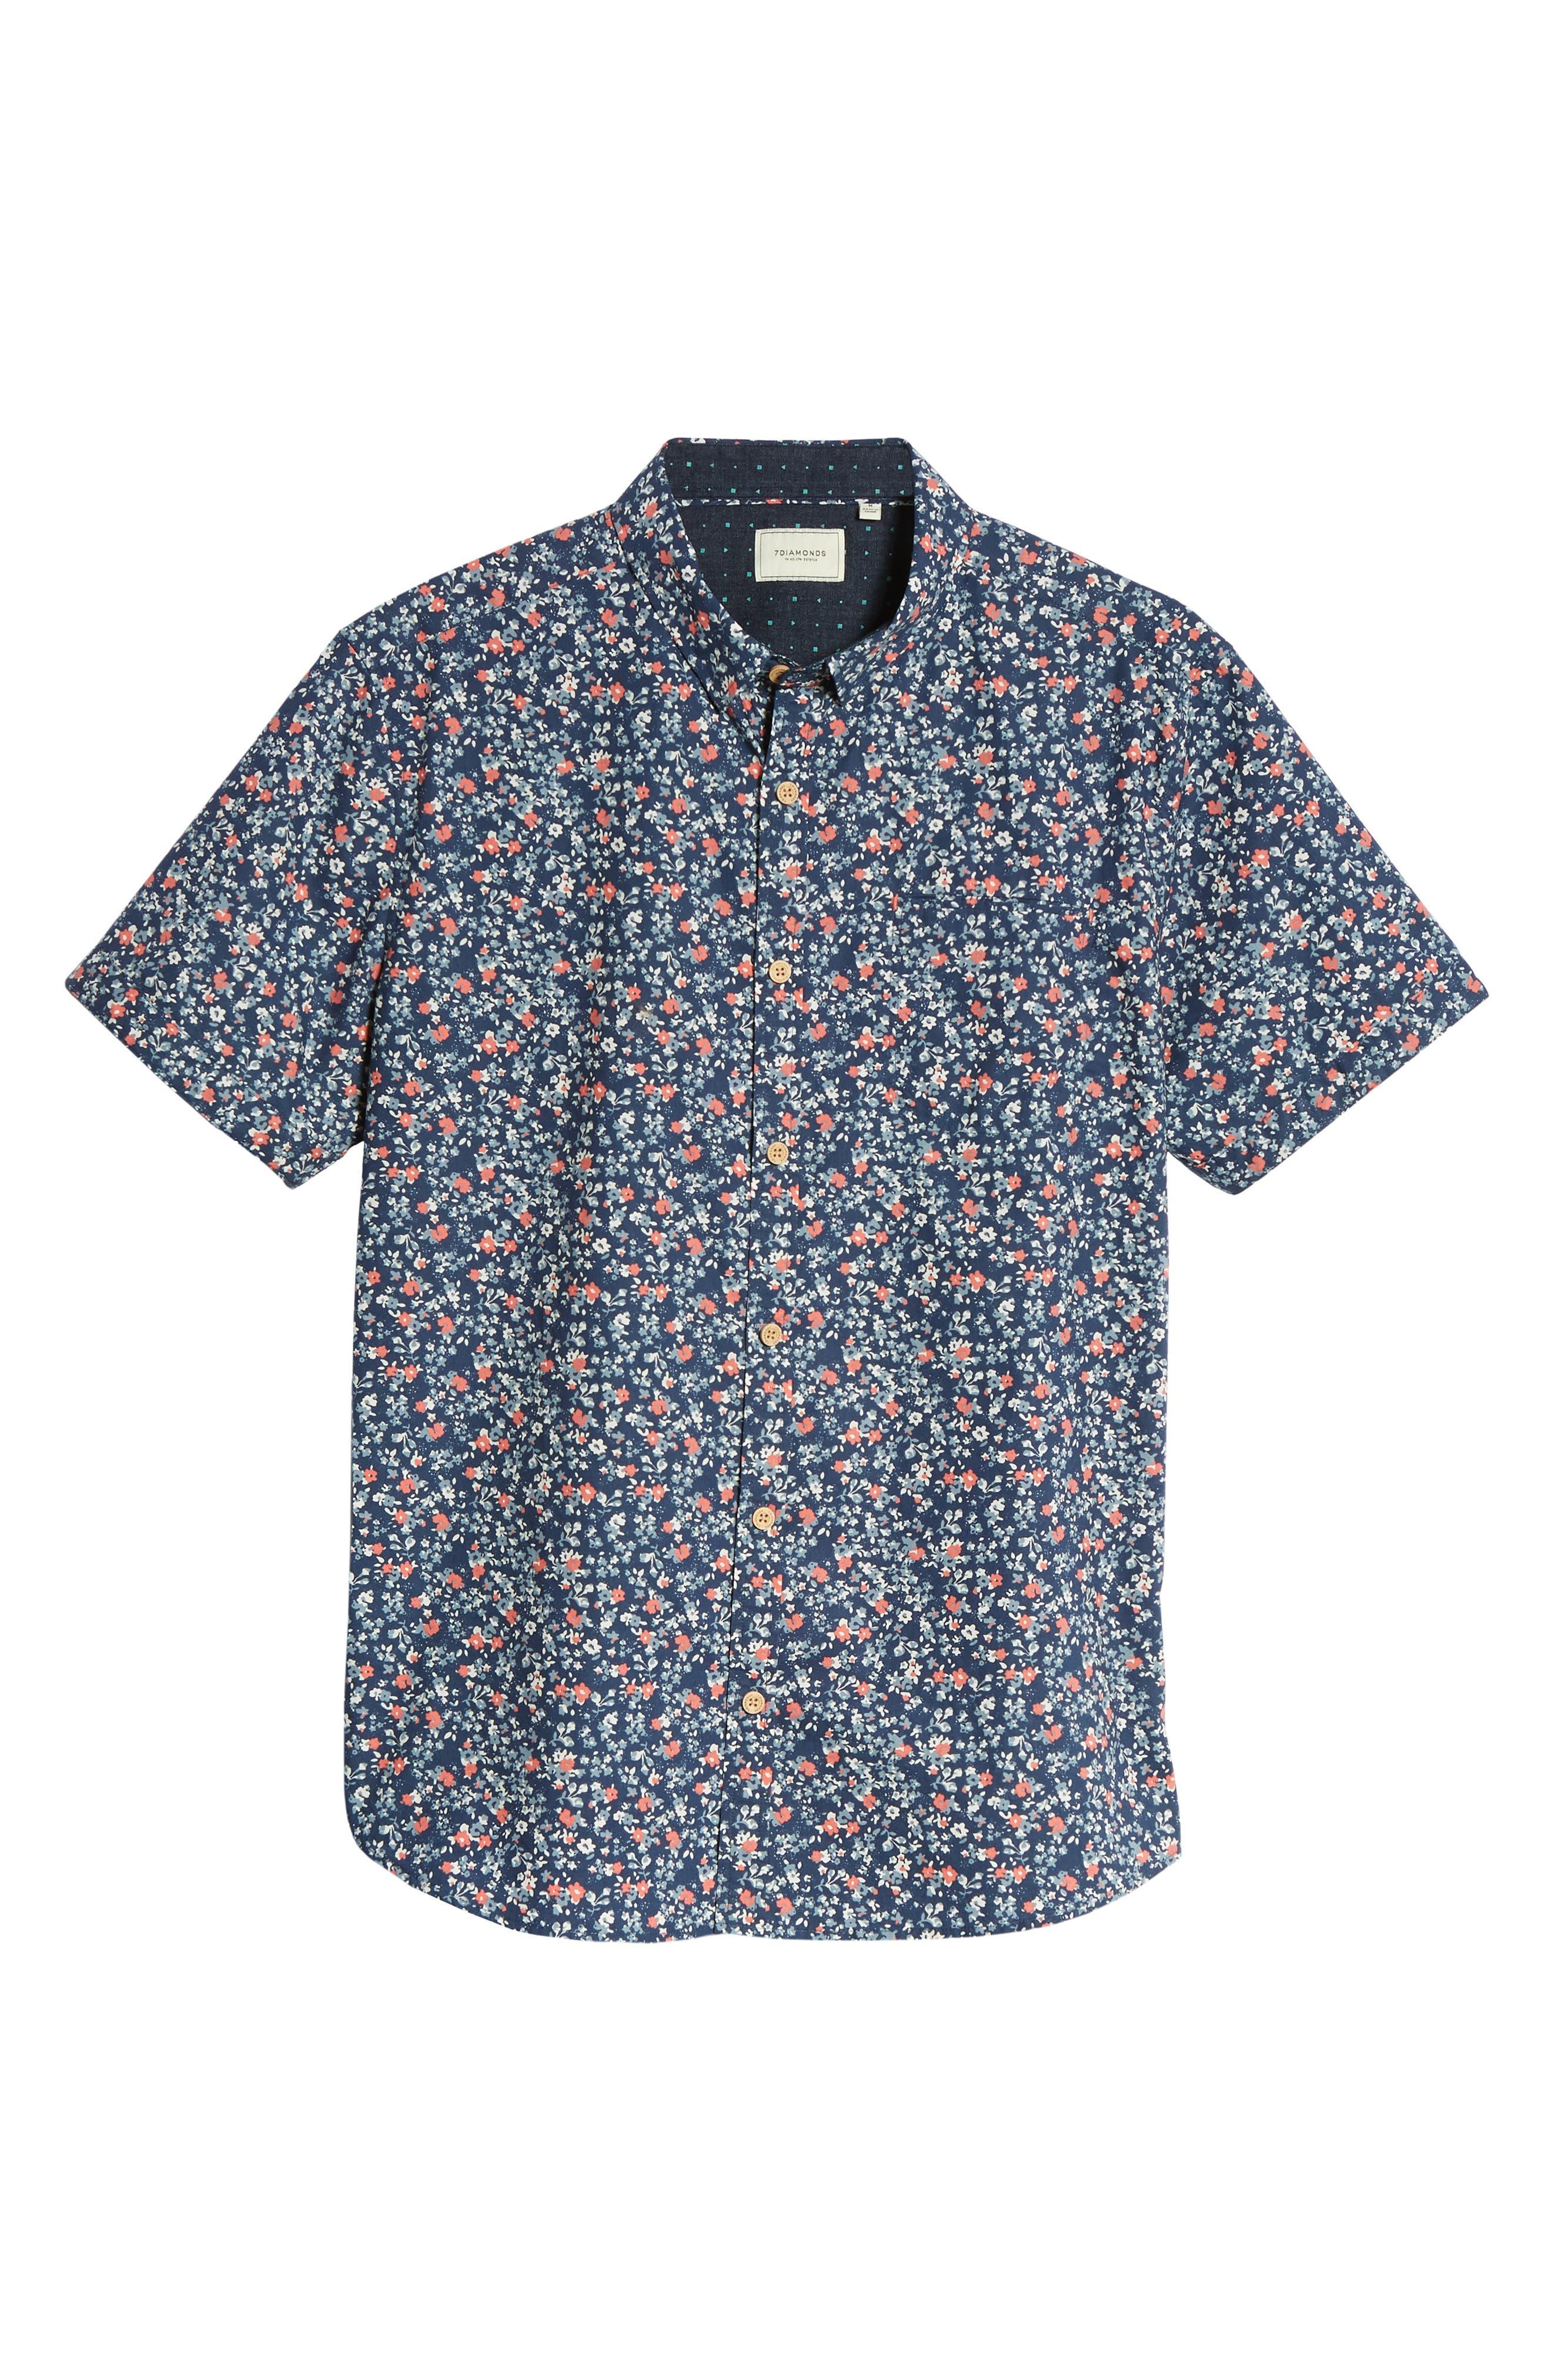 Memories Slim Fit Short Sleeve Sport Shirt,                             Alternate thumbnail 6, color,                             410